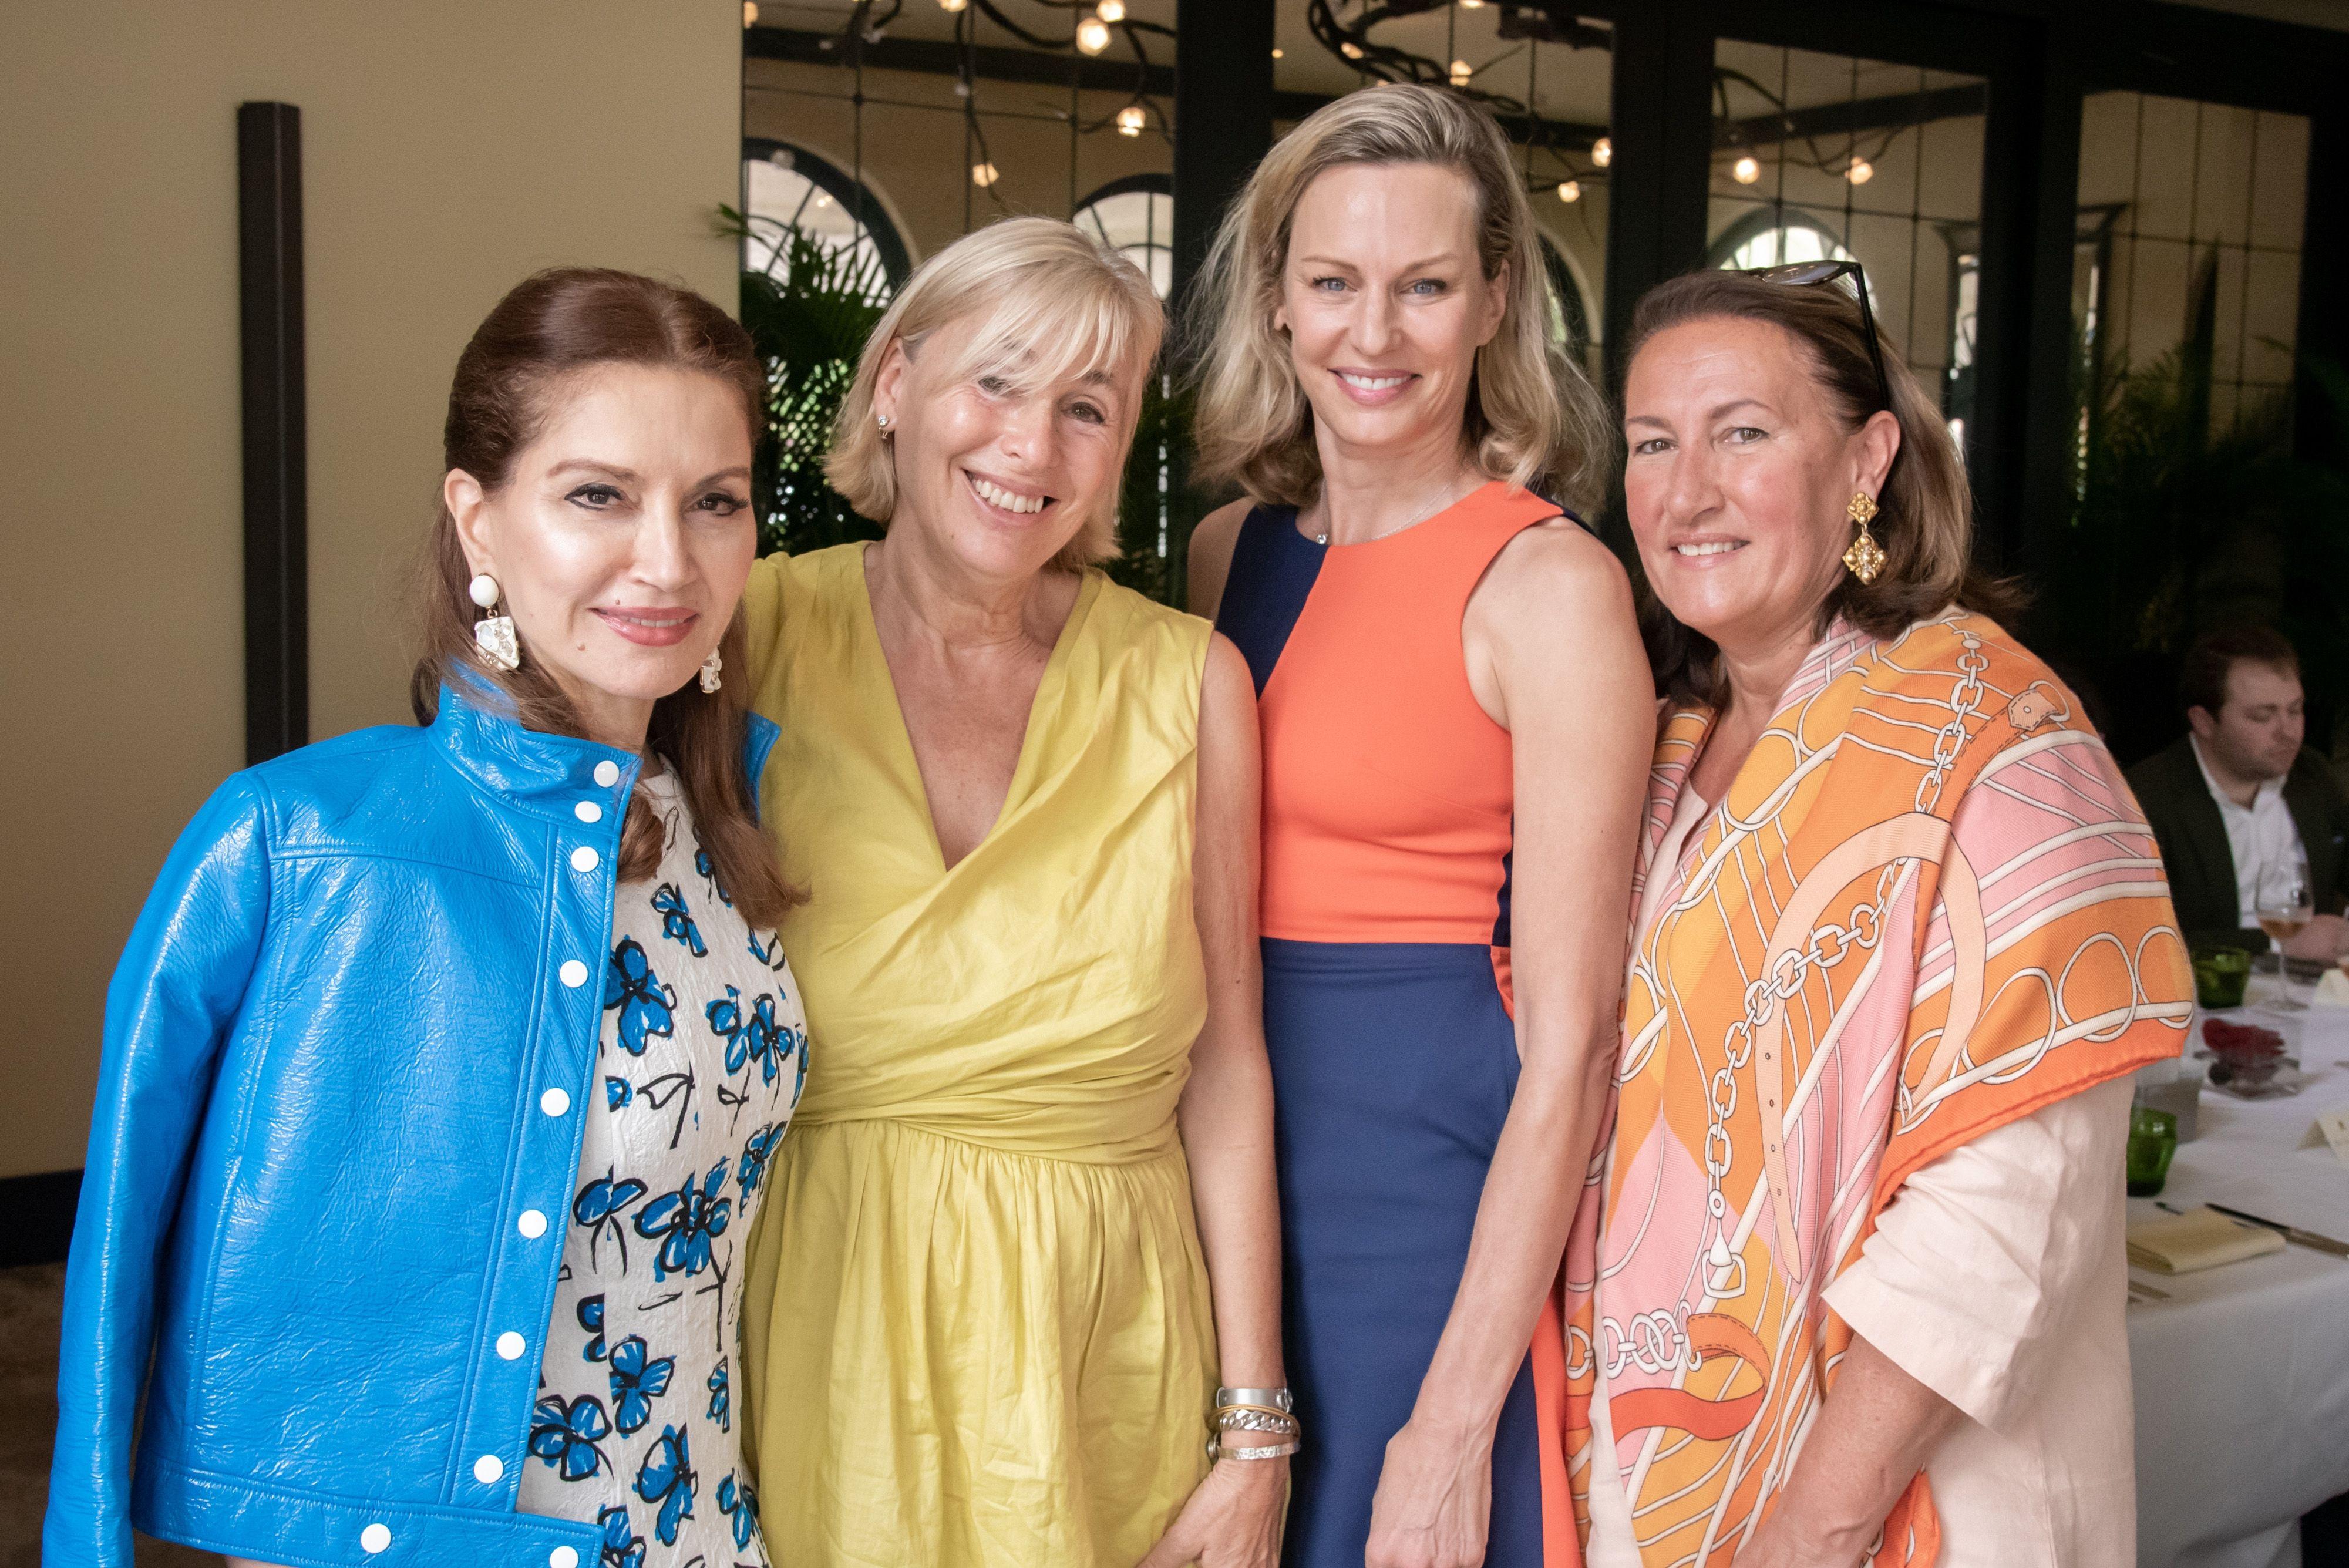 Jean Shafiroff Christine Schott Ledes In 2020 Black Tie Gala Jean Shafiroff Fashion